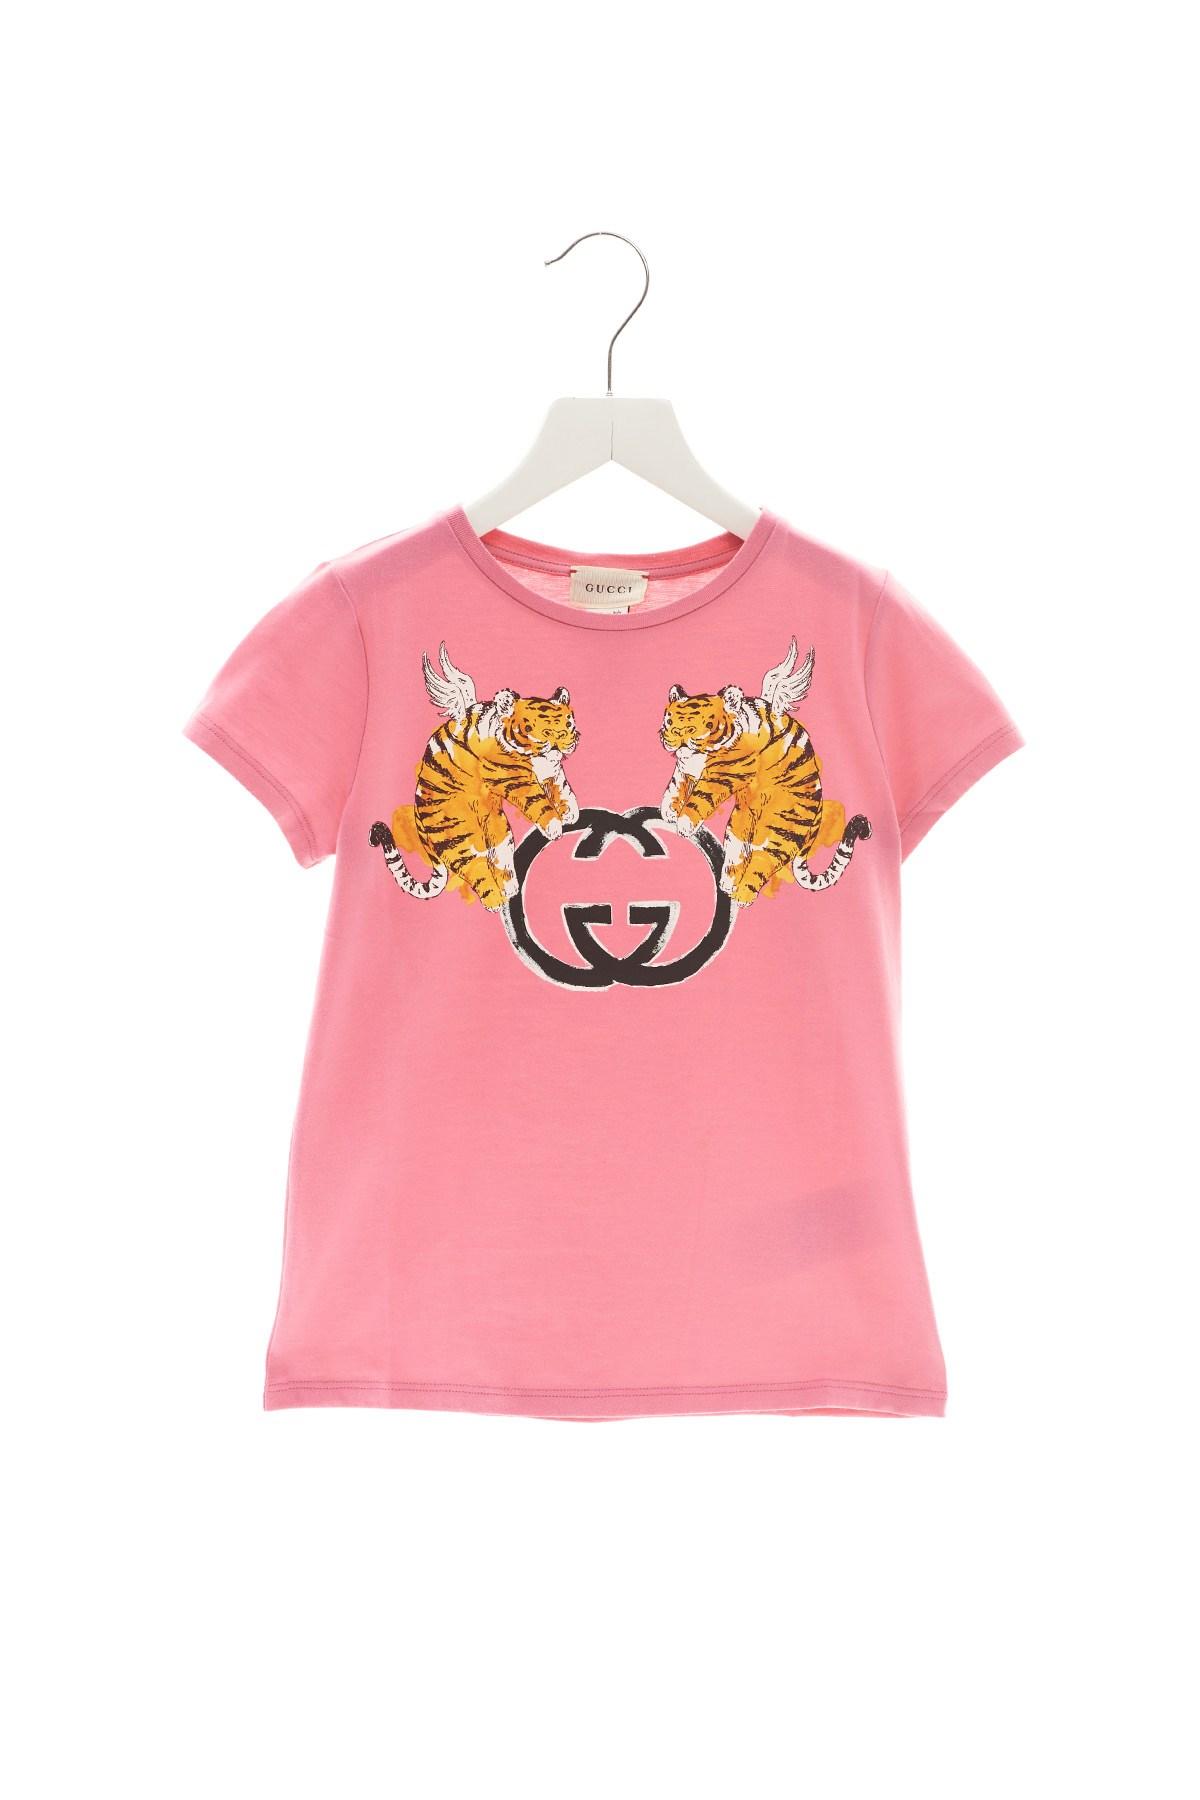 49a7fa6cfbf gucci  gg tigri  t-shirt available on julian-fashion.com - 65432